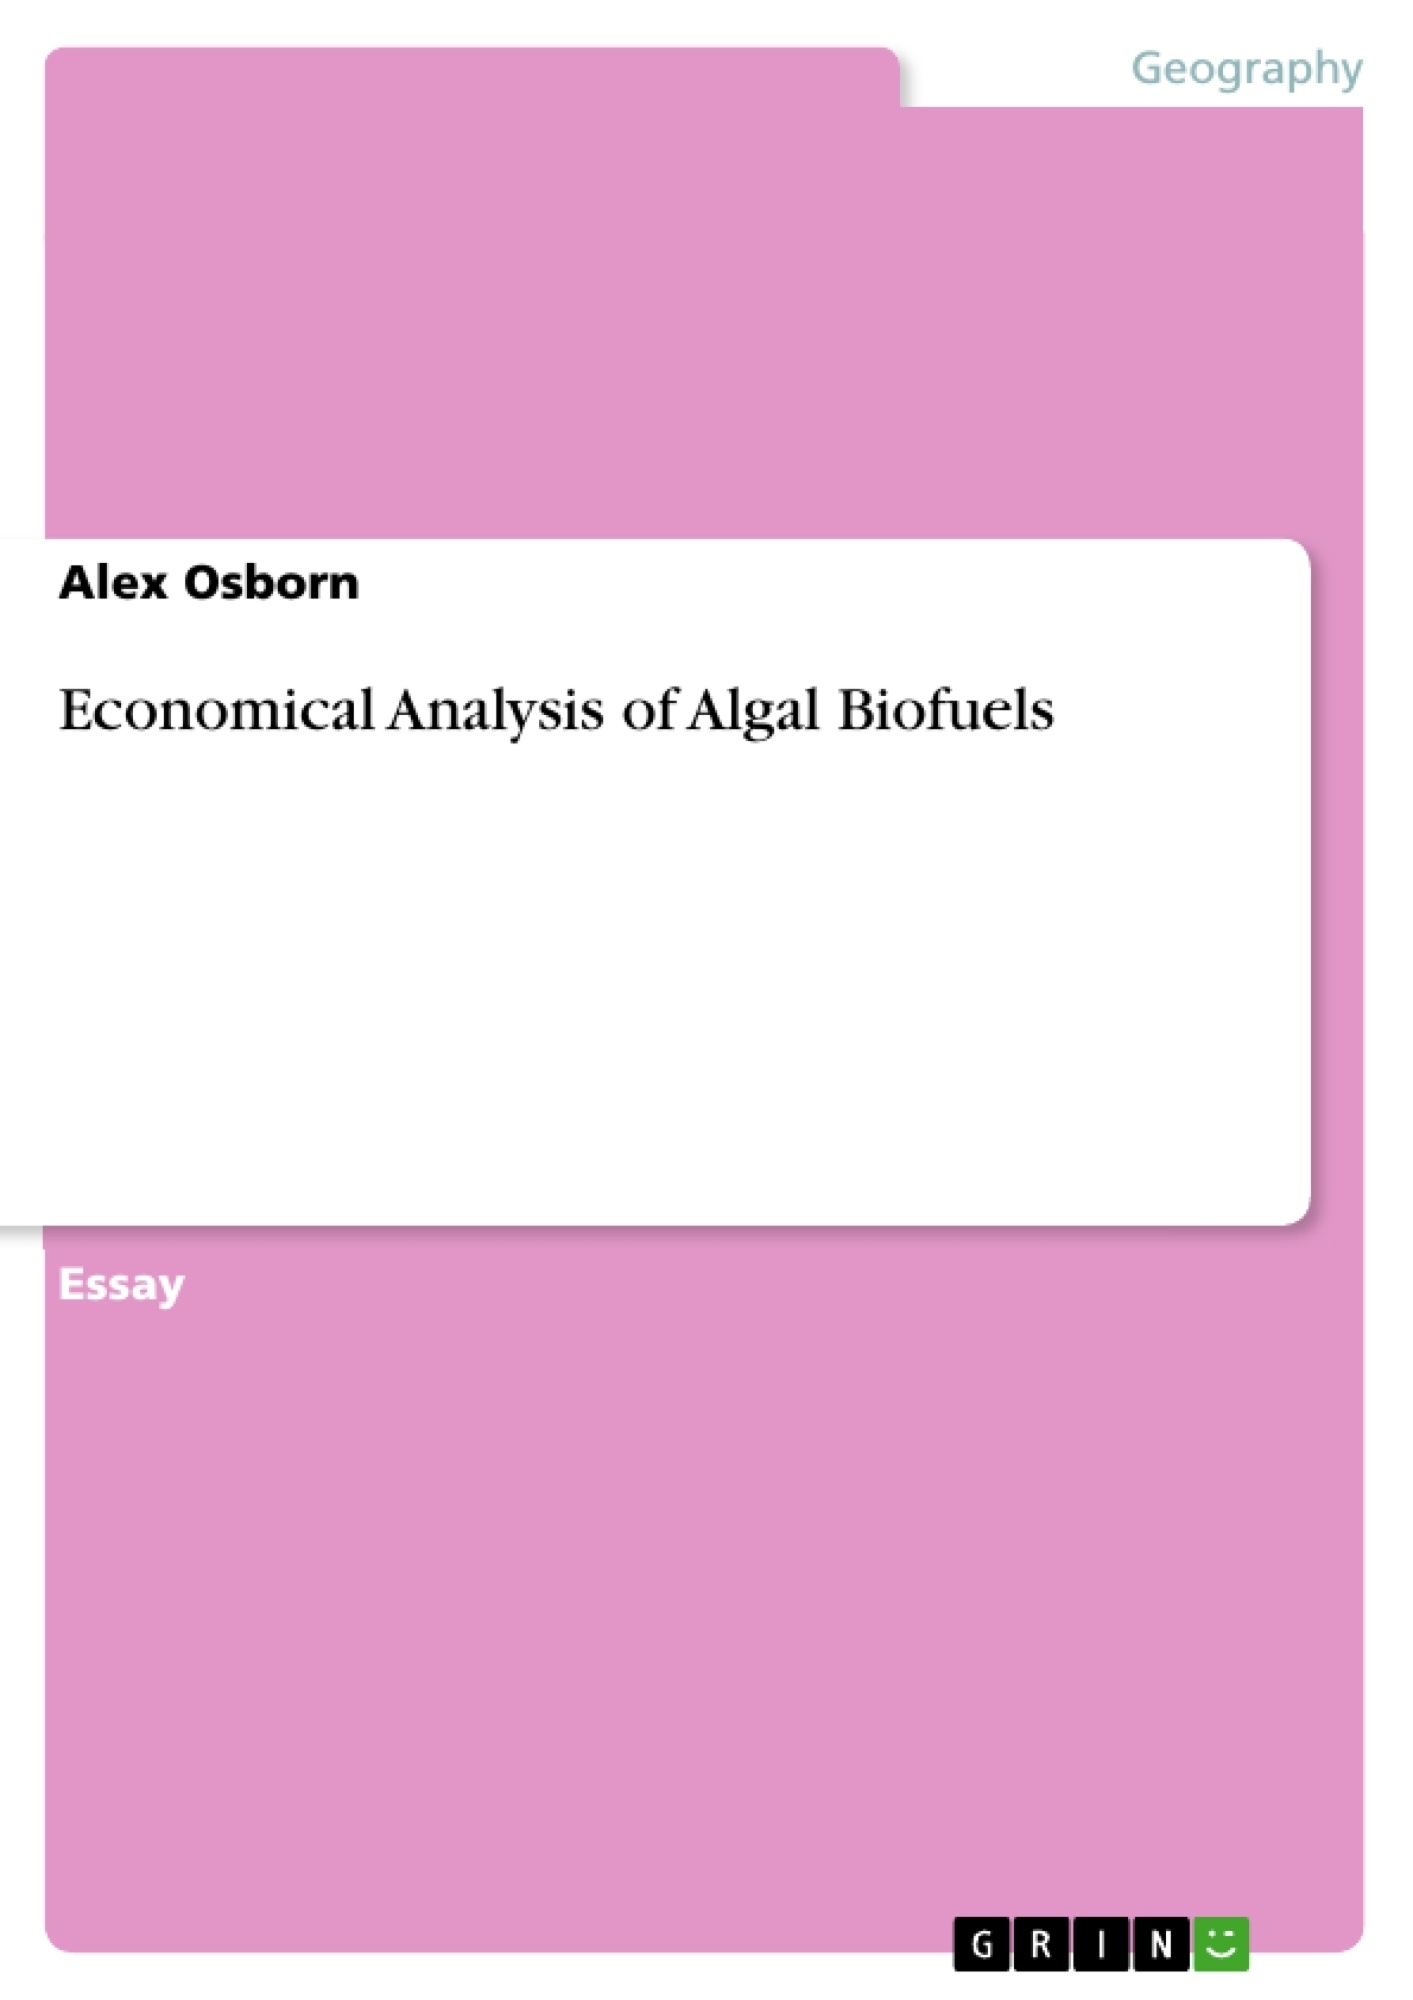 Title: Economical Analysis of Algal Biofuels